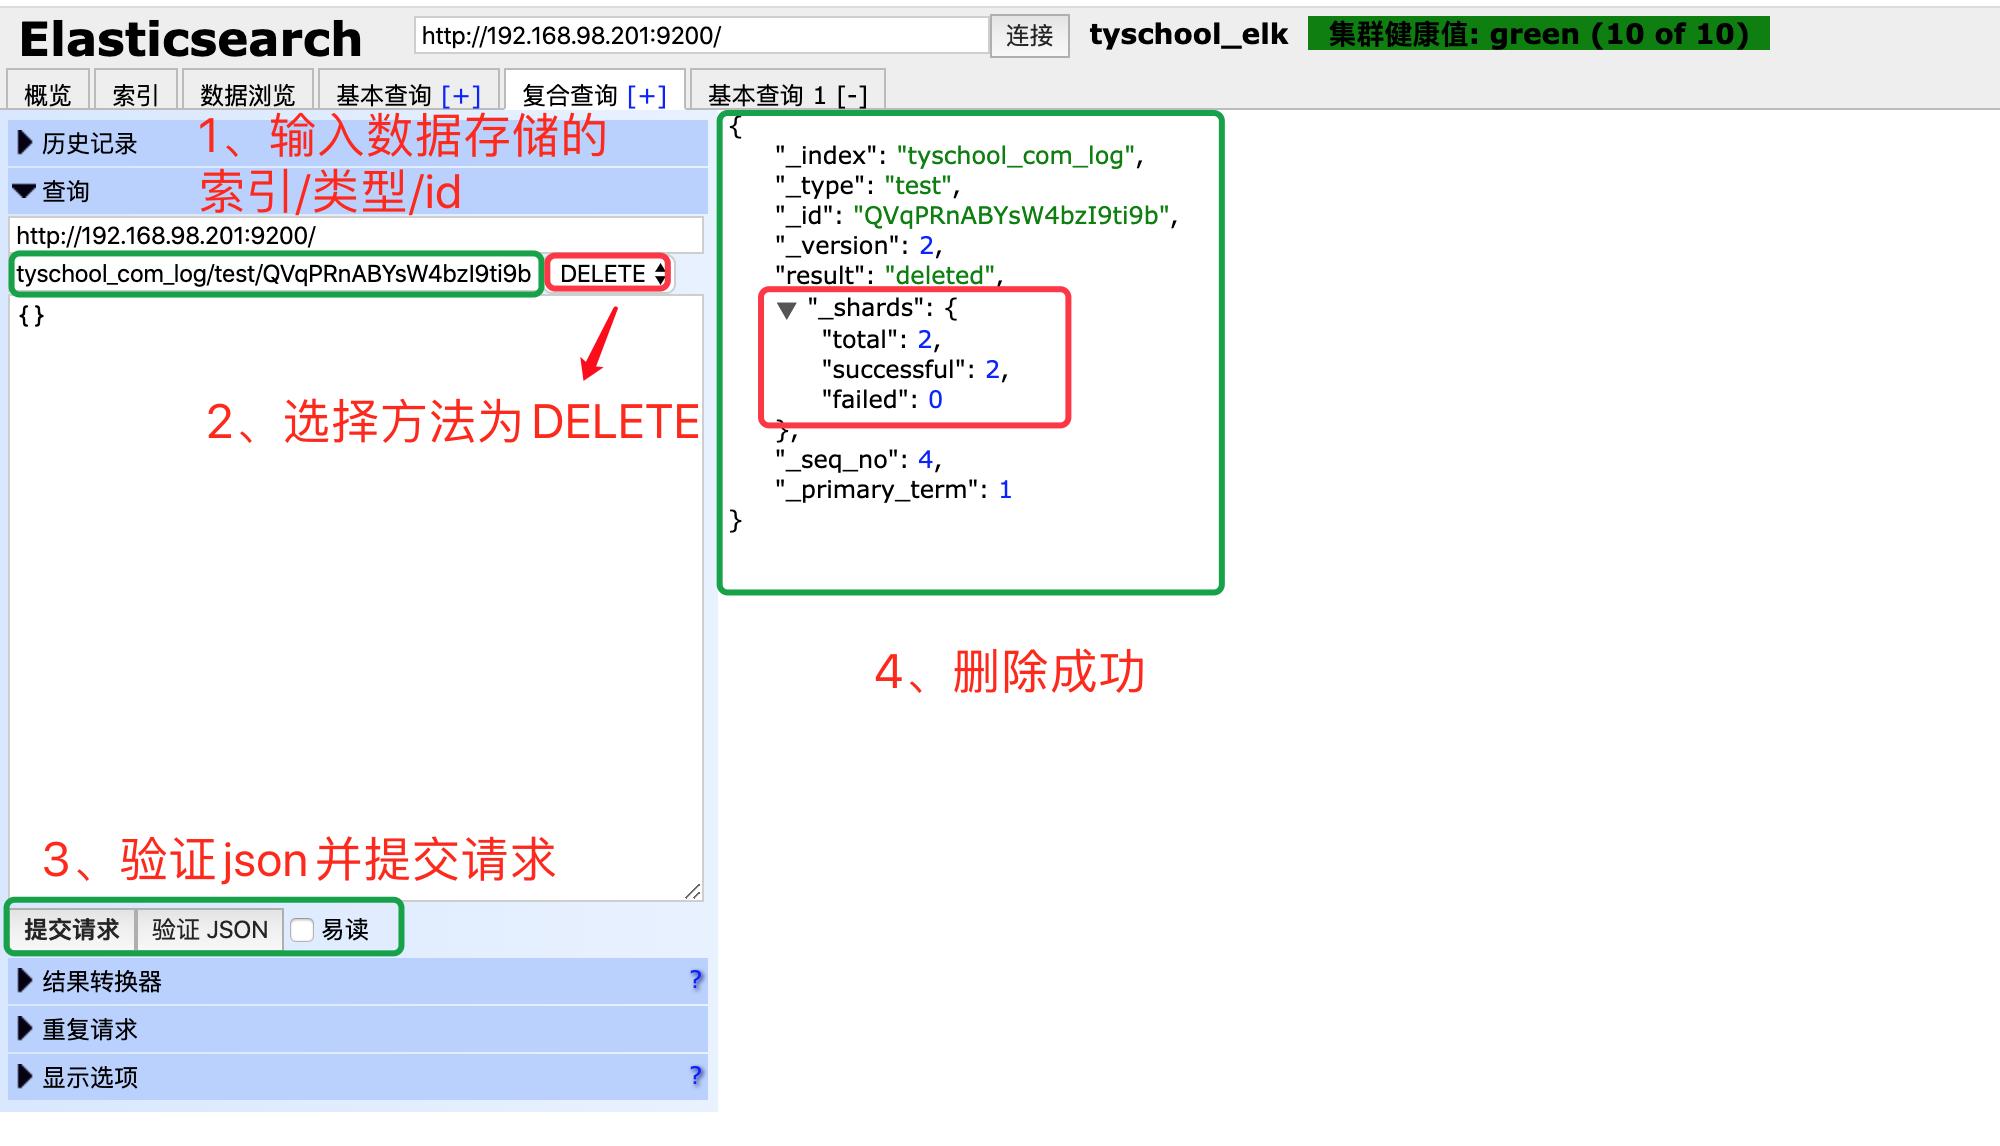 21_eshead_复合查询_删除数据.png